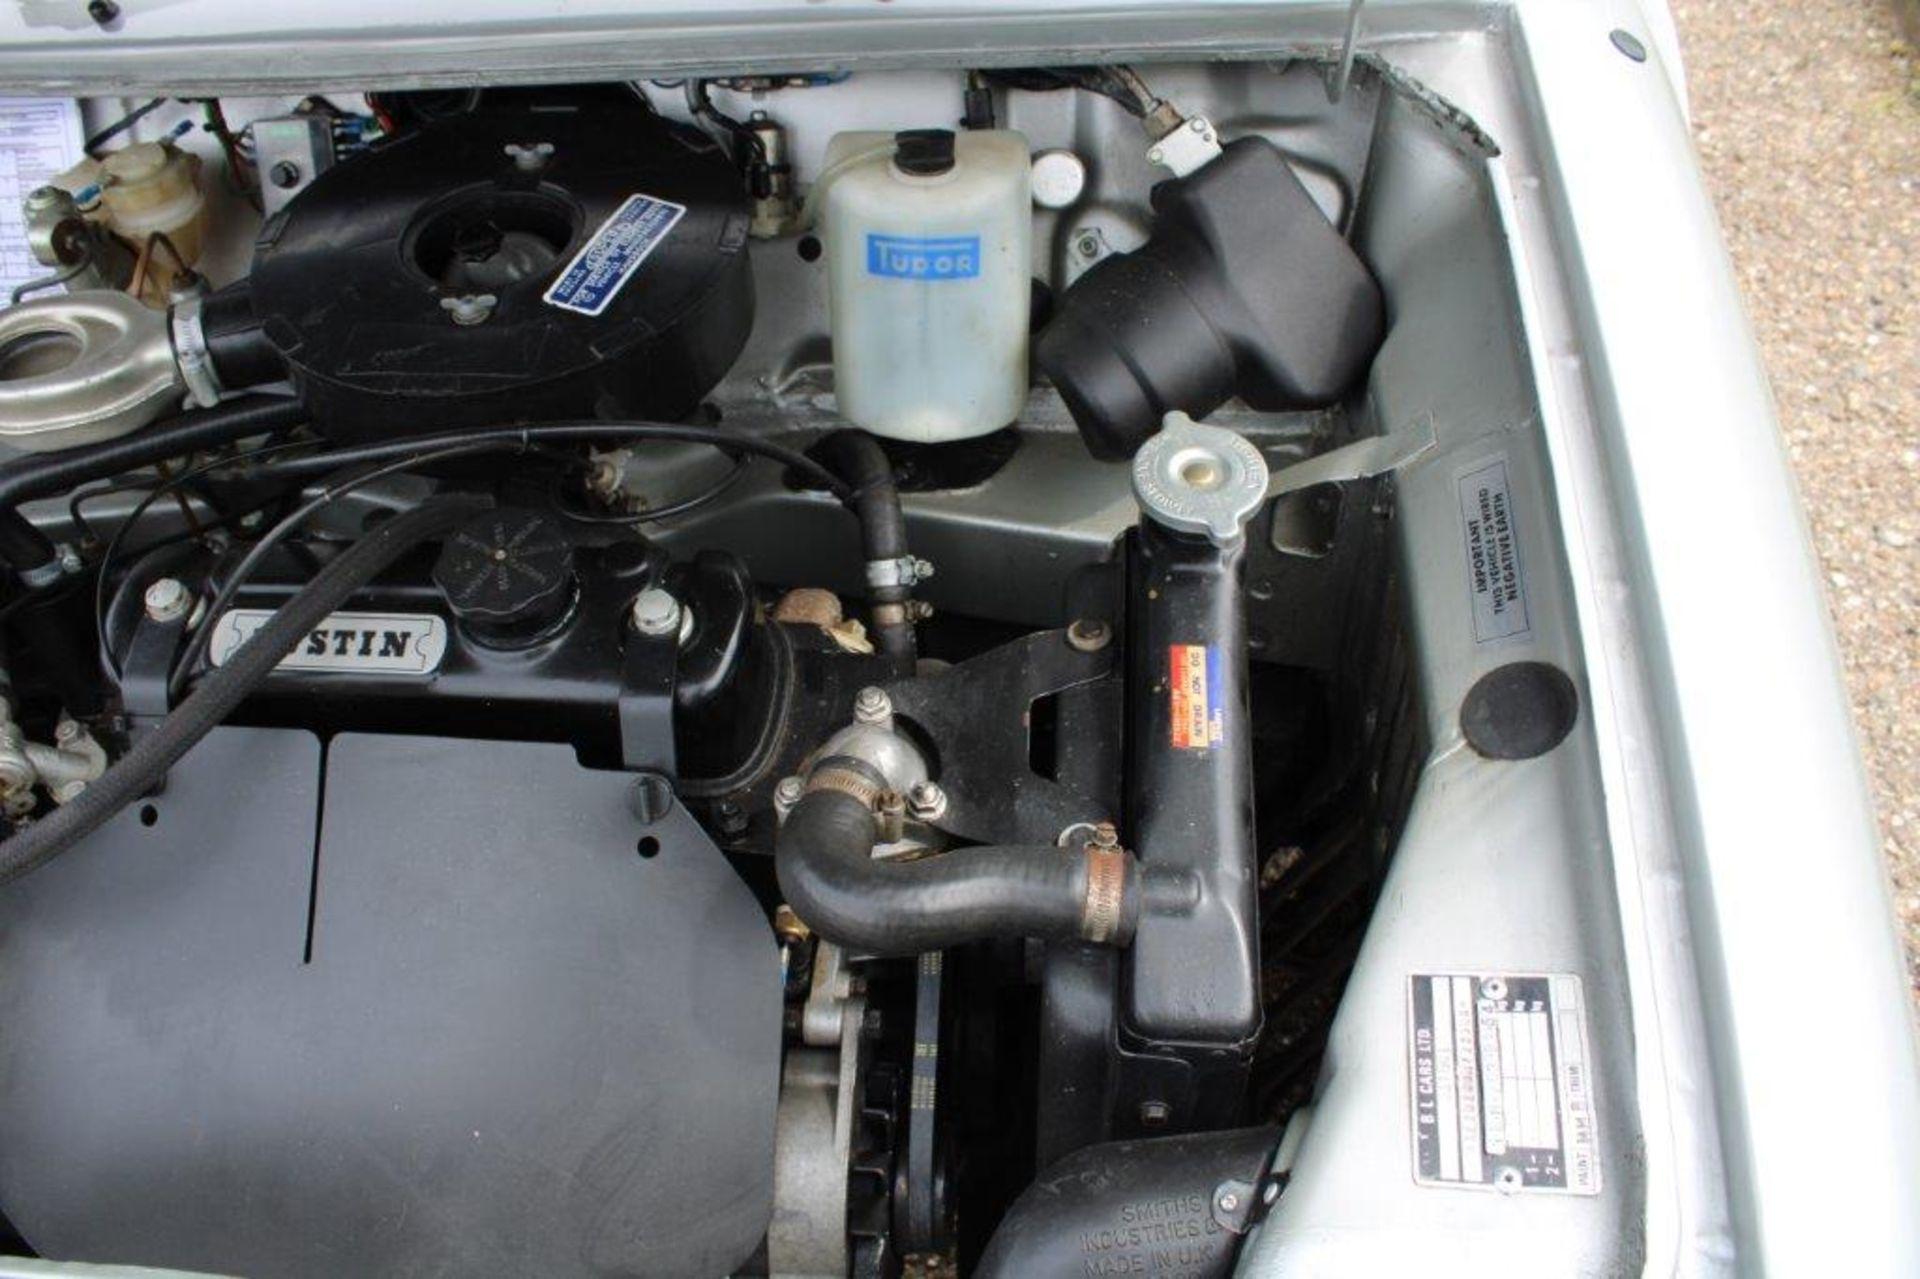 1980 Austin Morris Mini 1275 GT - Image 23 of 28